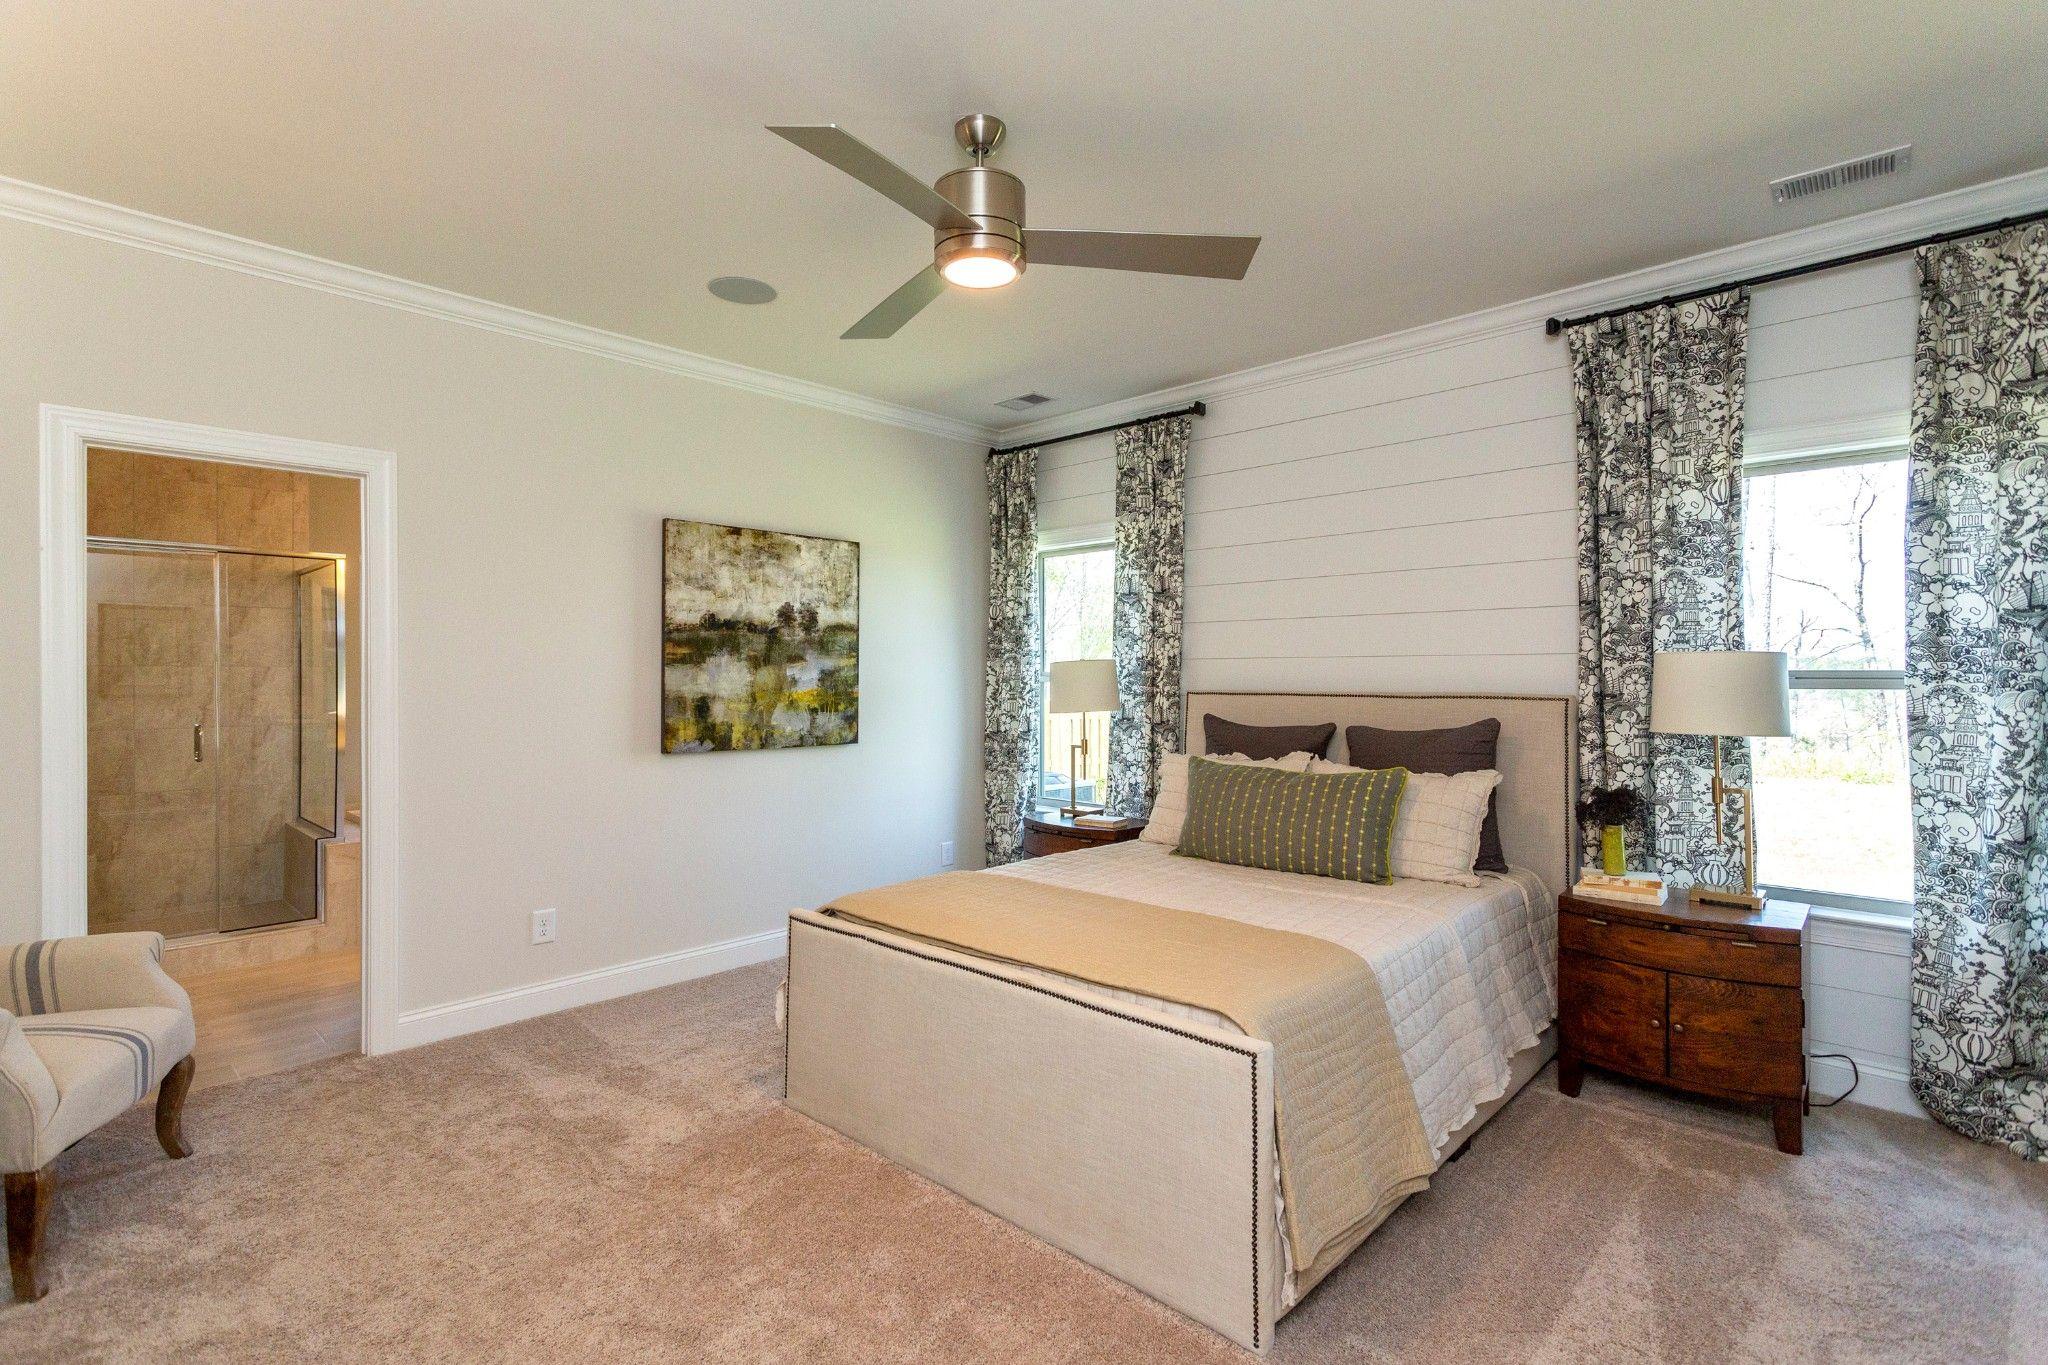 Bedroom featured in the Jefferson By Harris Doyle Homes Inc in Birmingham, AL